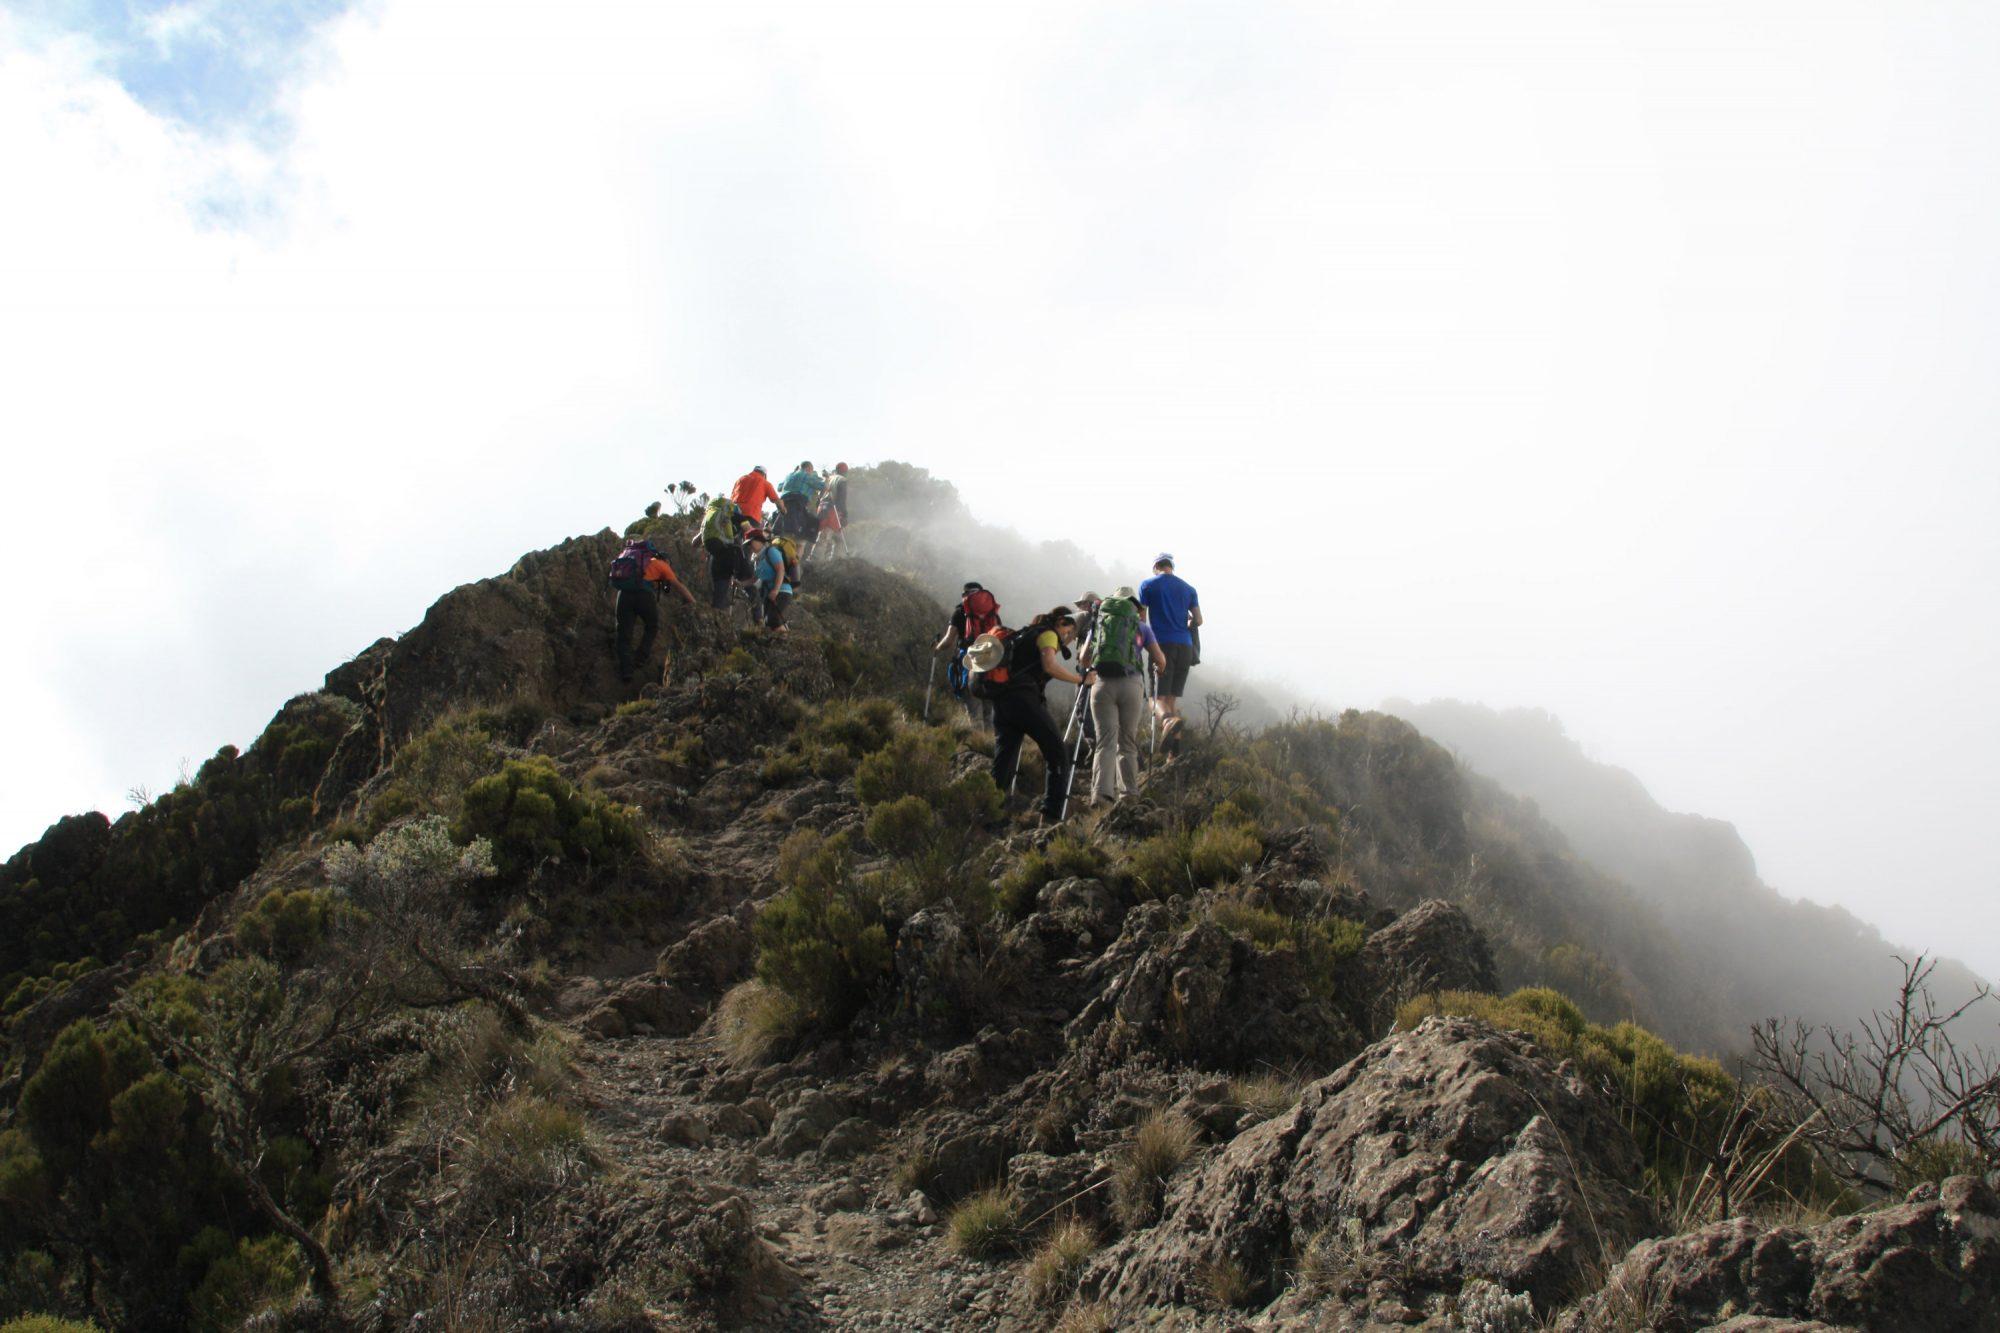 Little Meru im Nebel, Mount Meru, Regenwald, Arusha Nationalpark, Tansania, Afrika